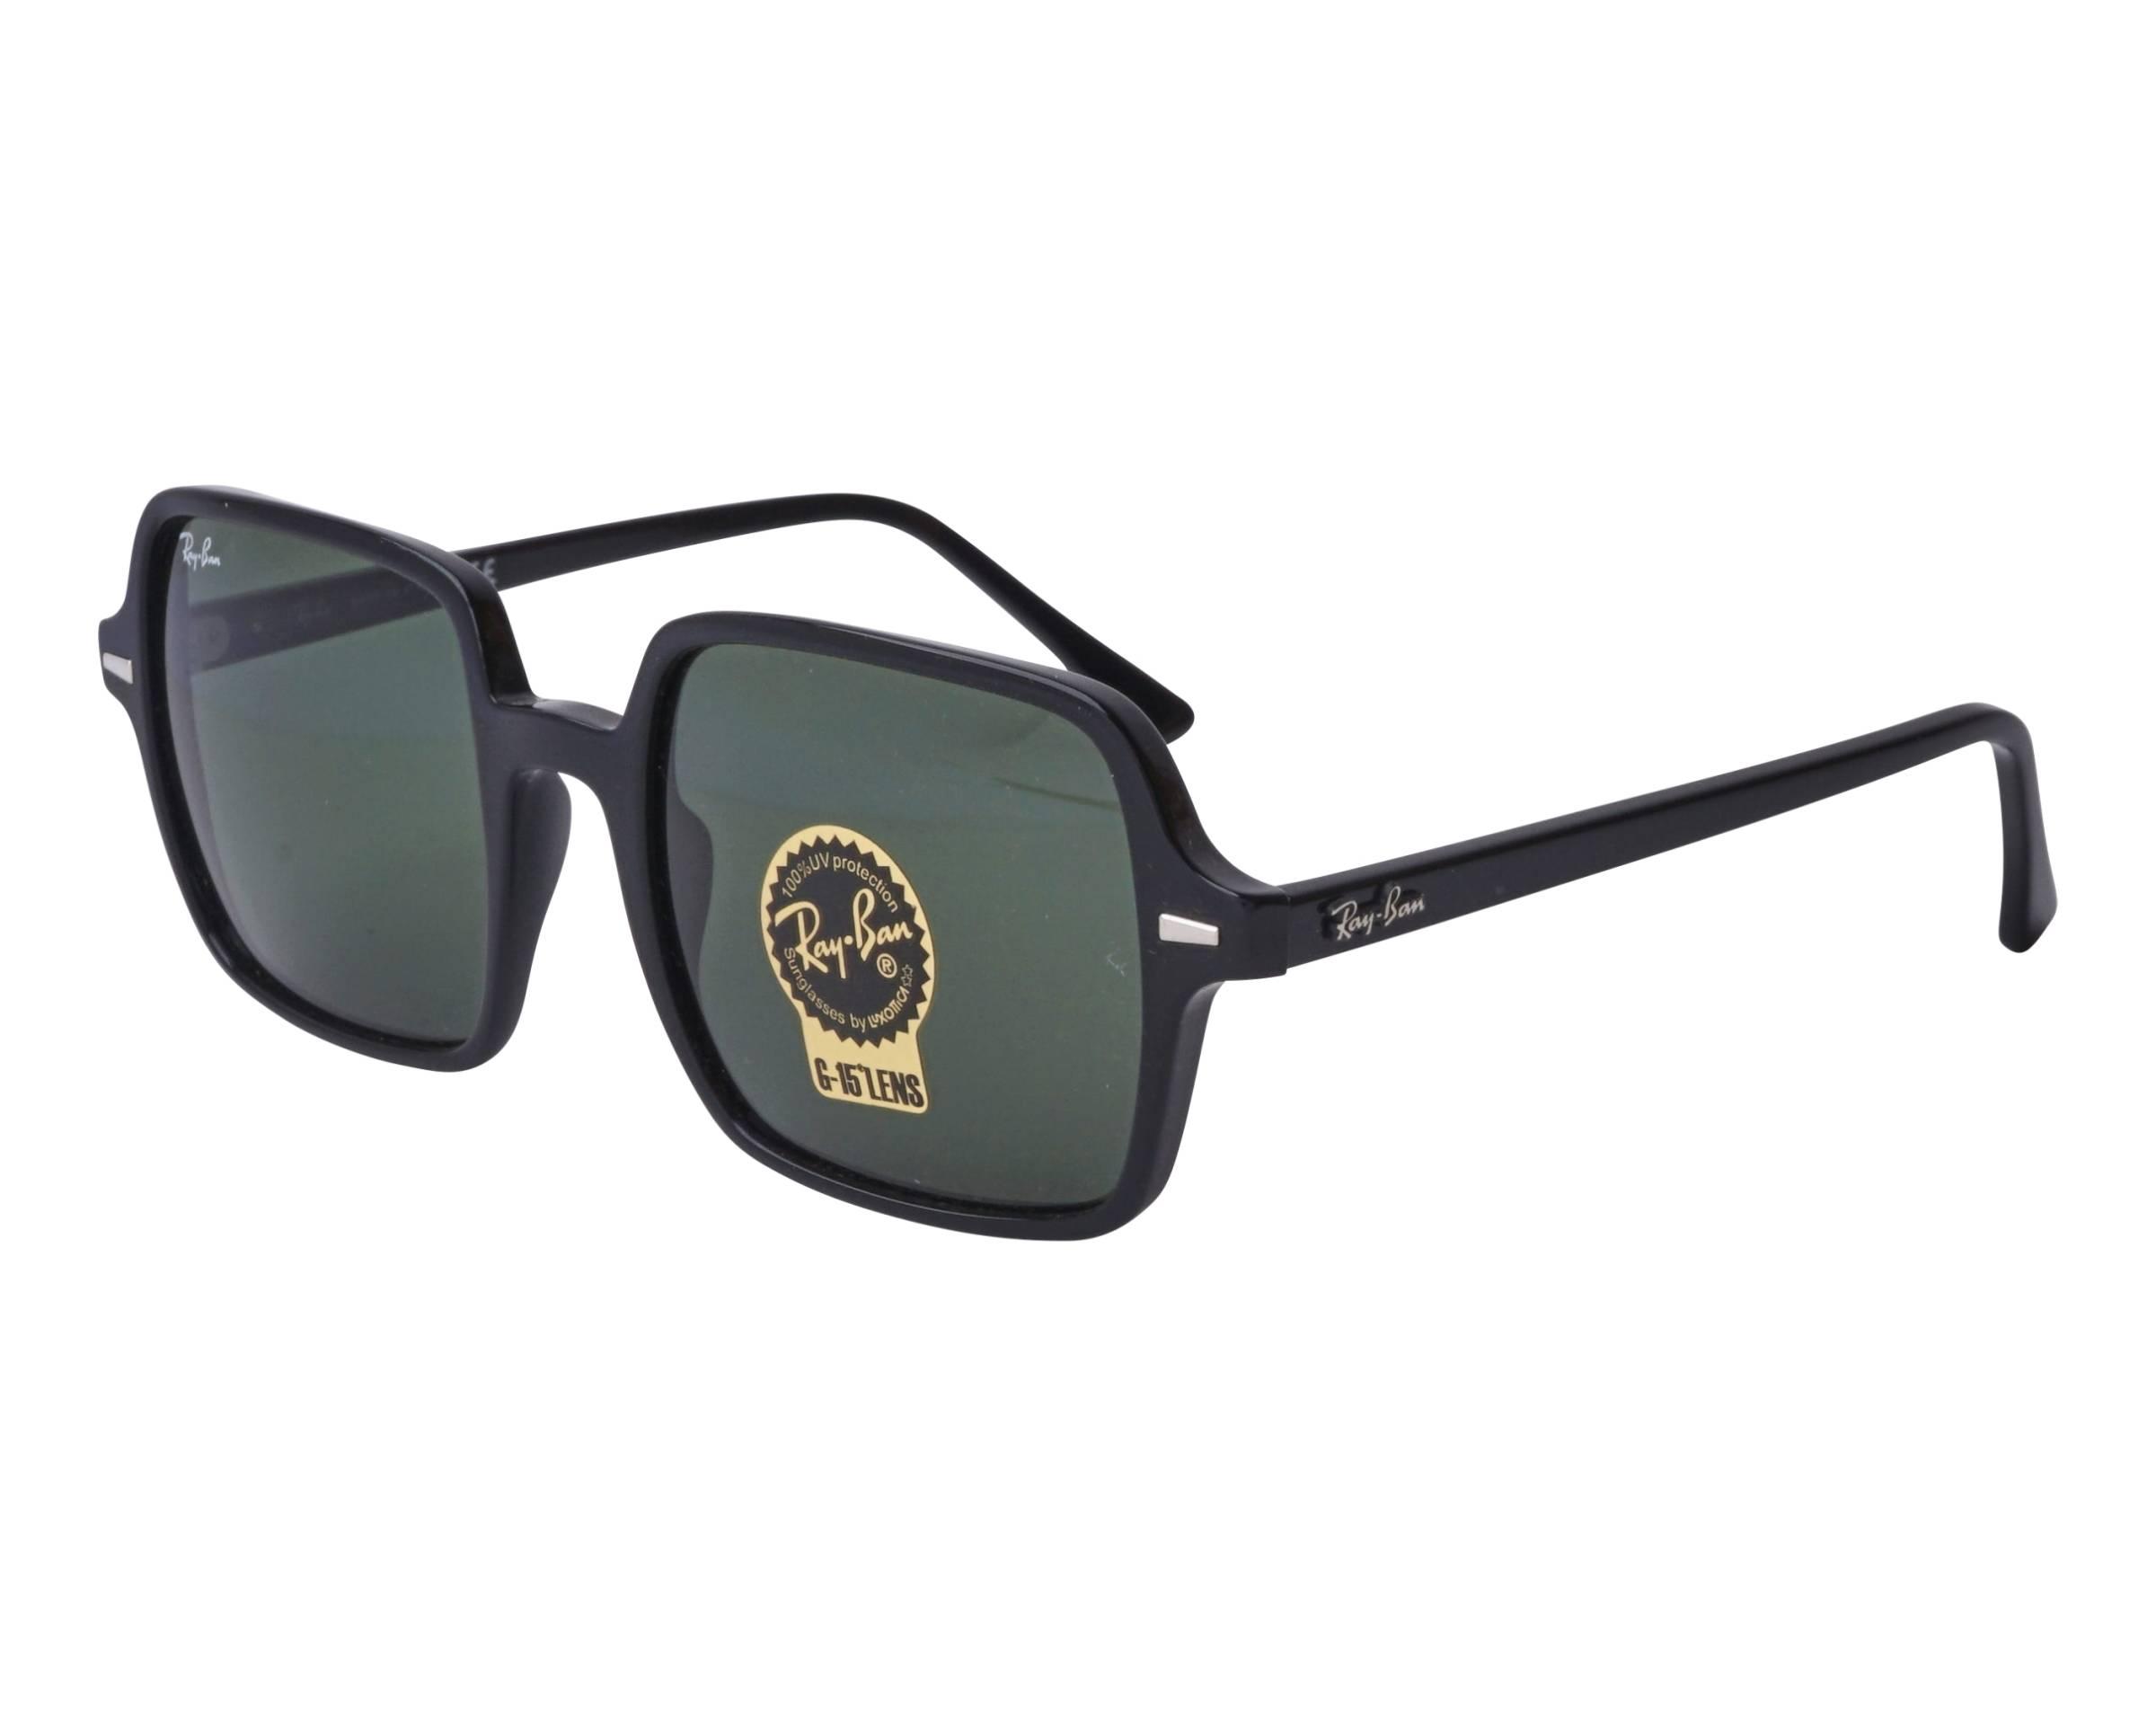 Ray-Ban Sunglasses SQUARE II RB-1973 901/31